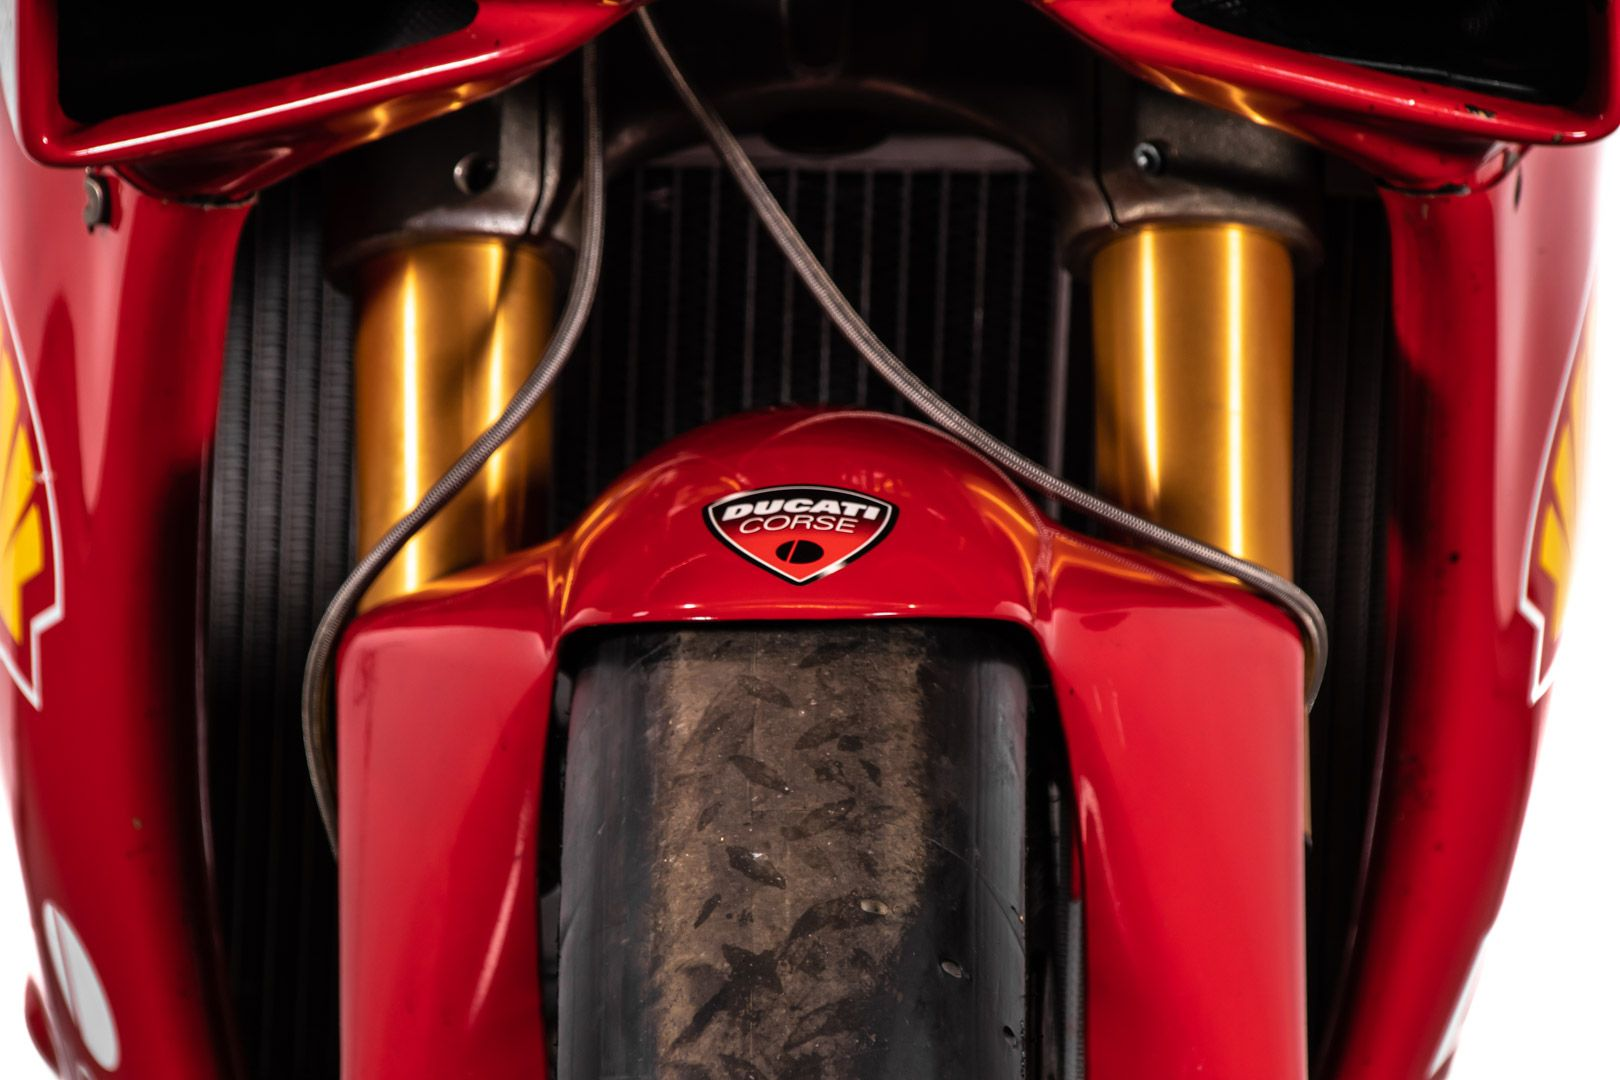 2008 Ducati 996 Fogarty Evocation 03/12 84224